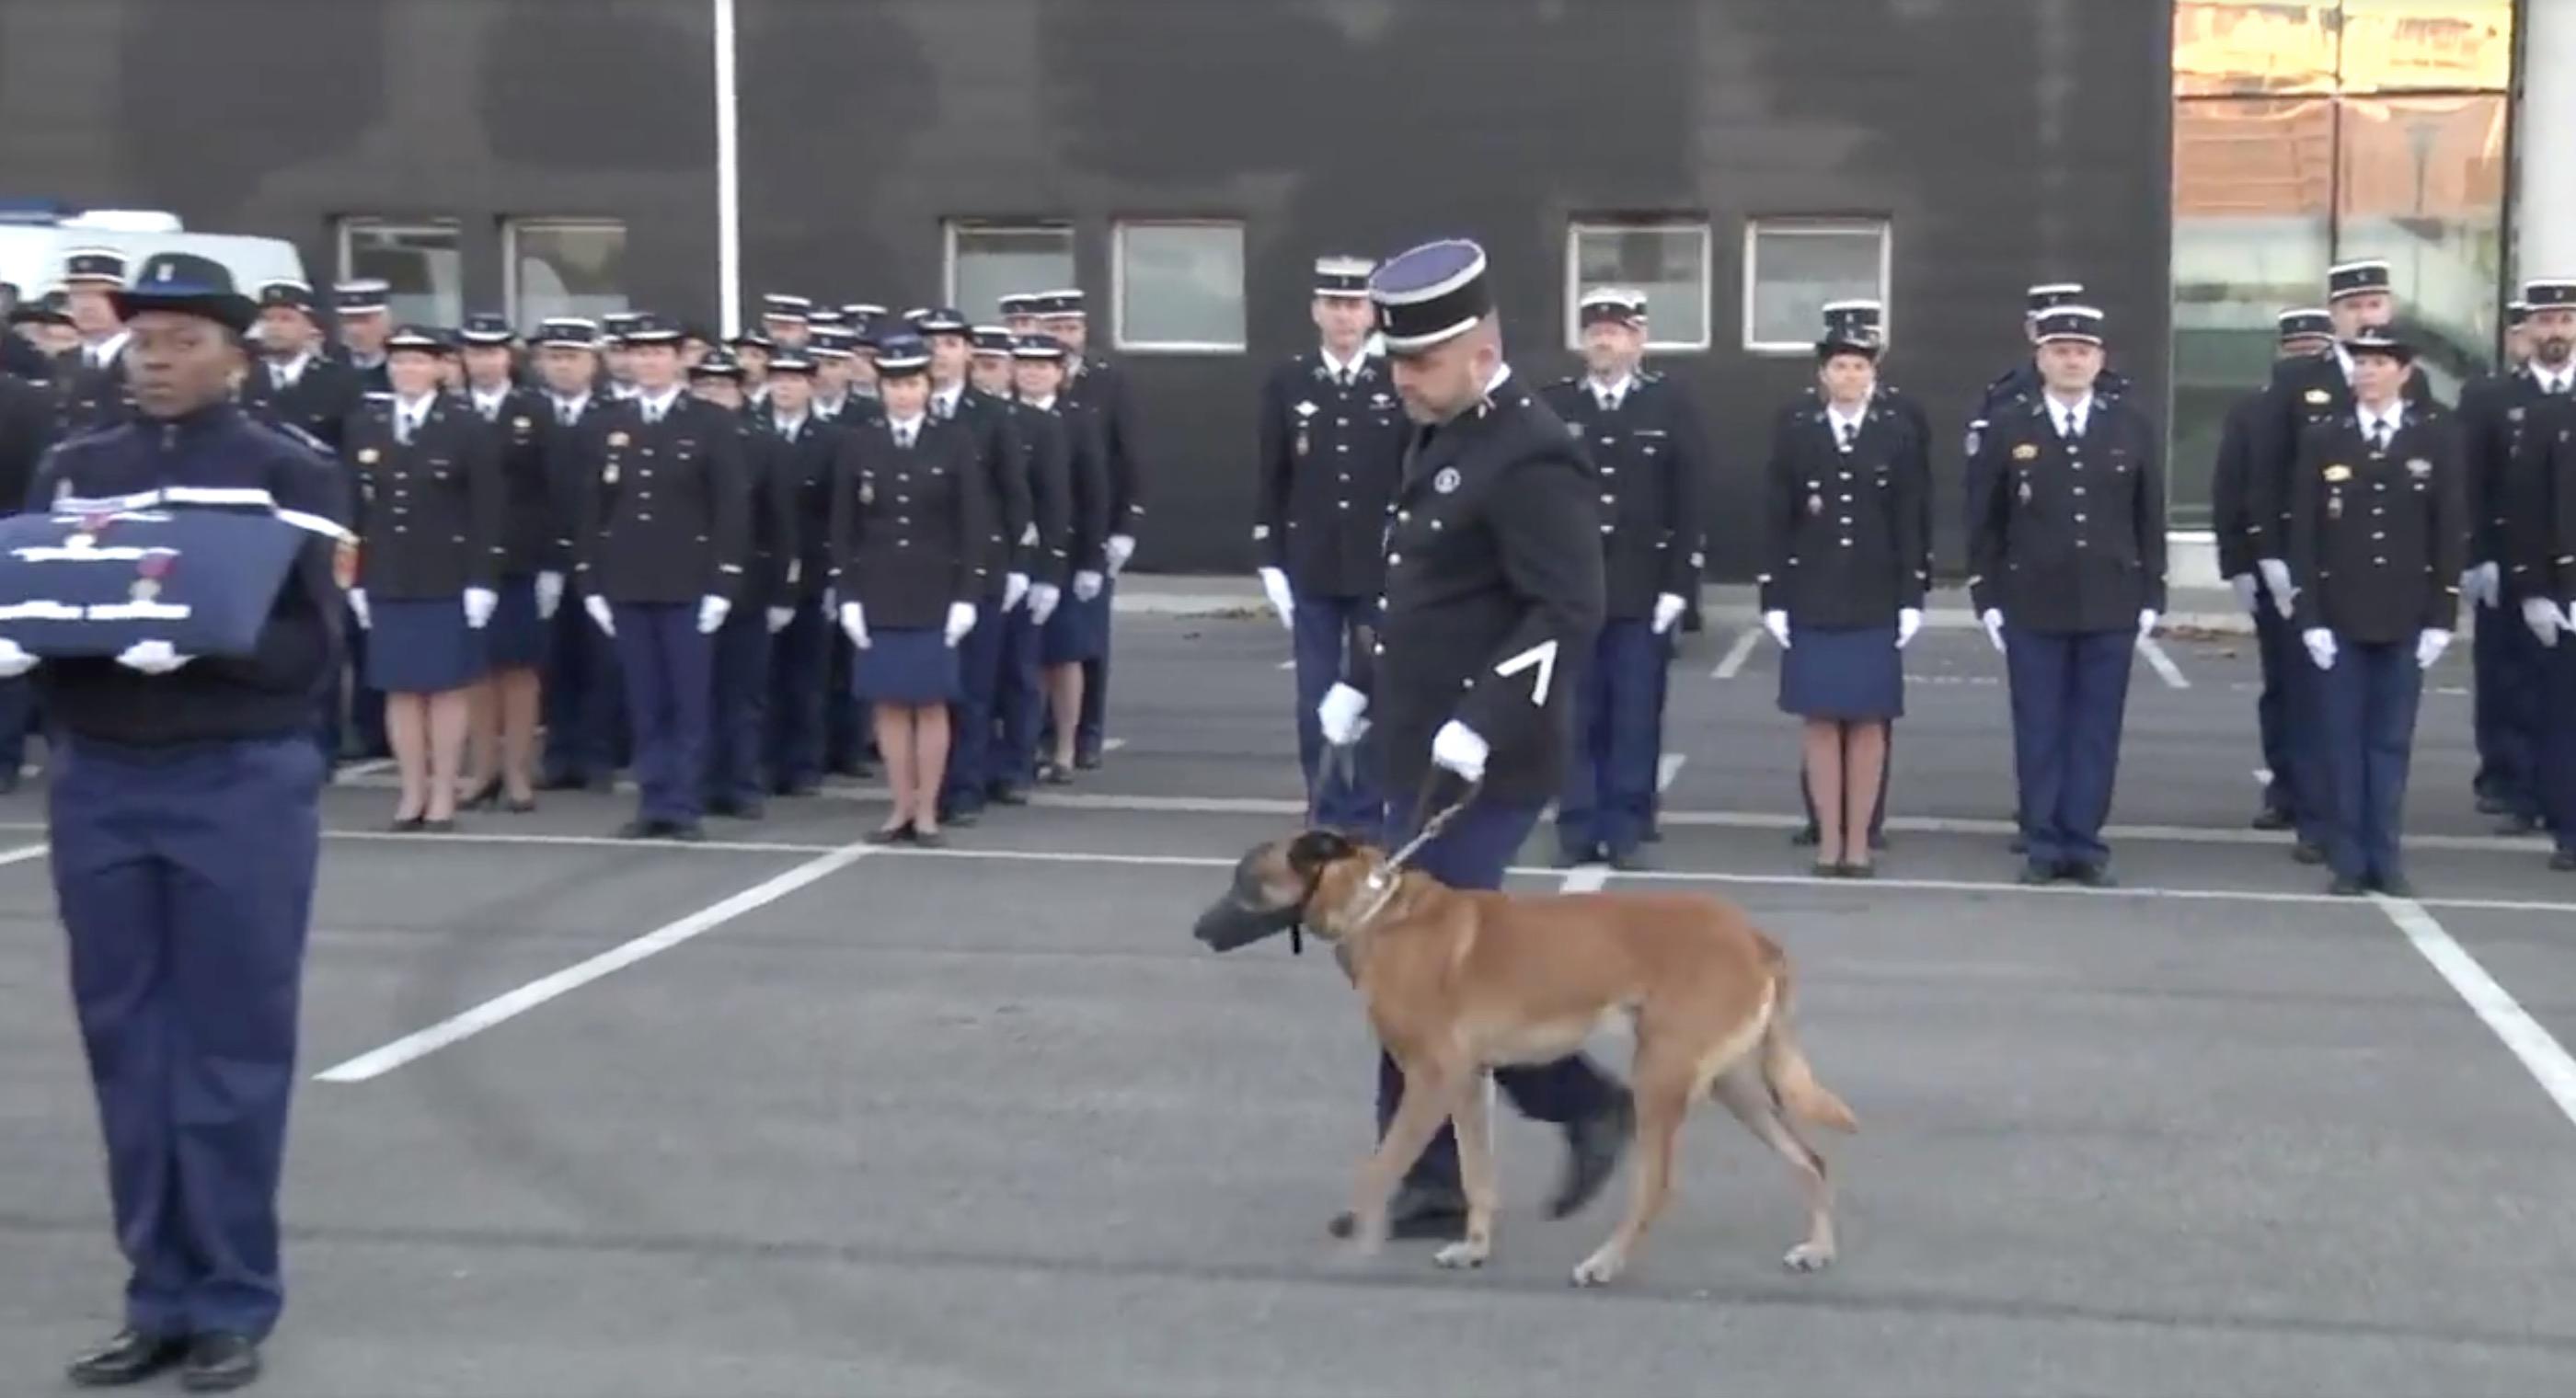 officier-montpellier-chien-decoration-malinois-5